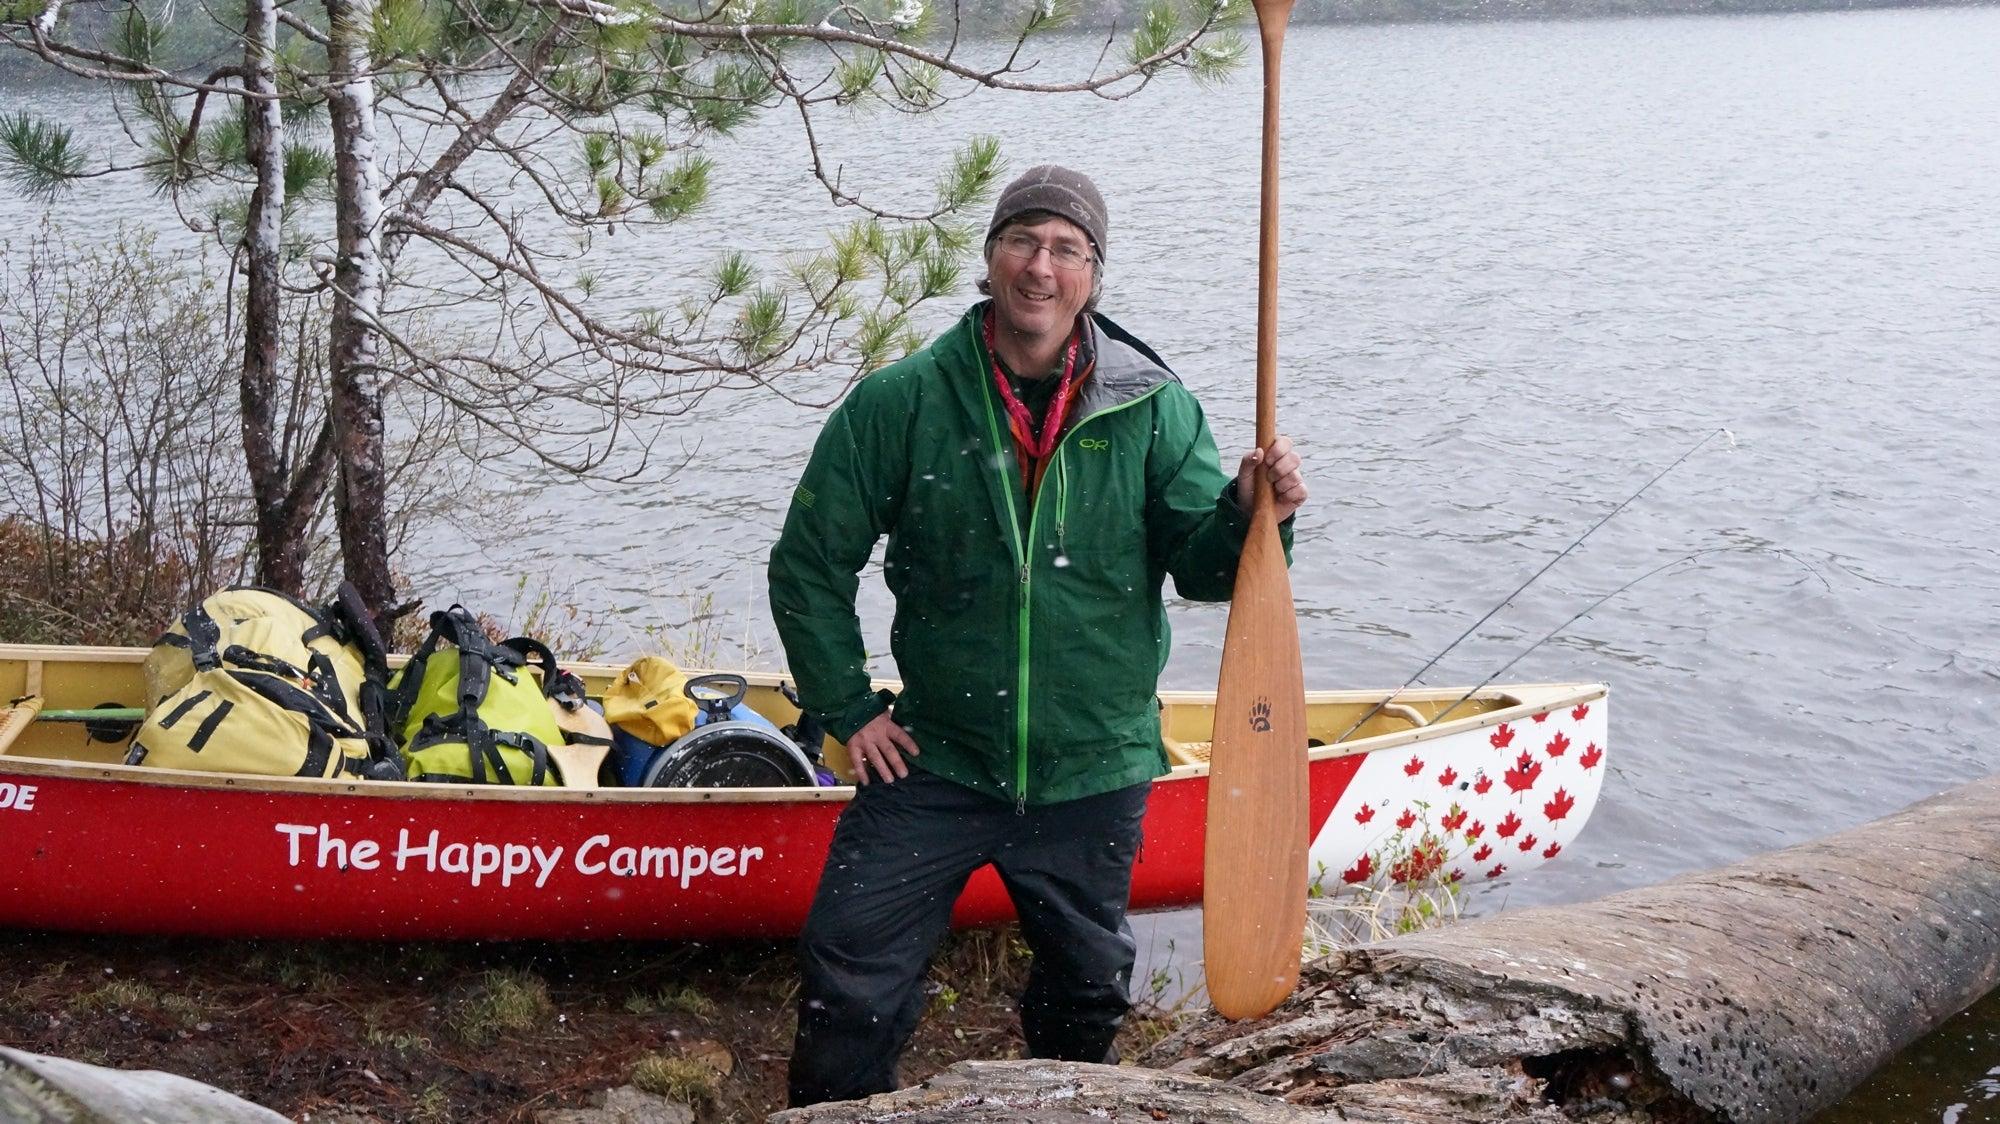 Up Close: Kevin Callan, A Really Happy Camper